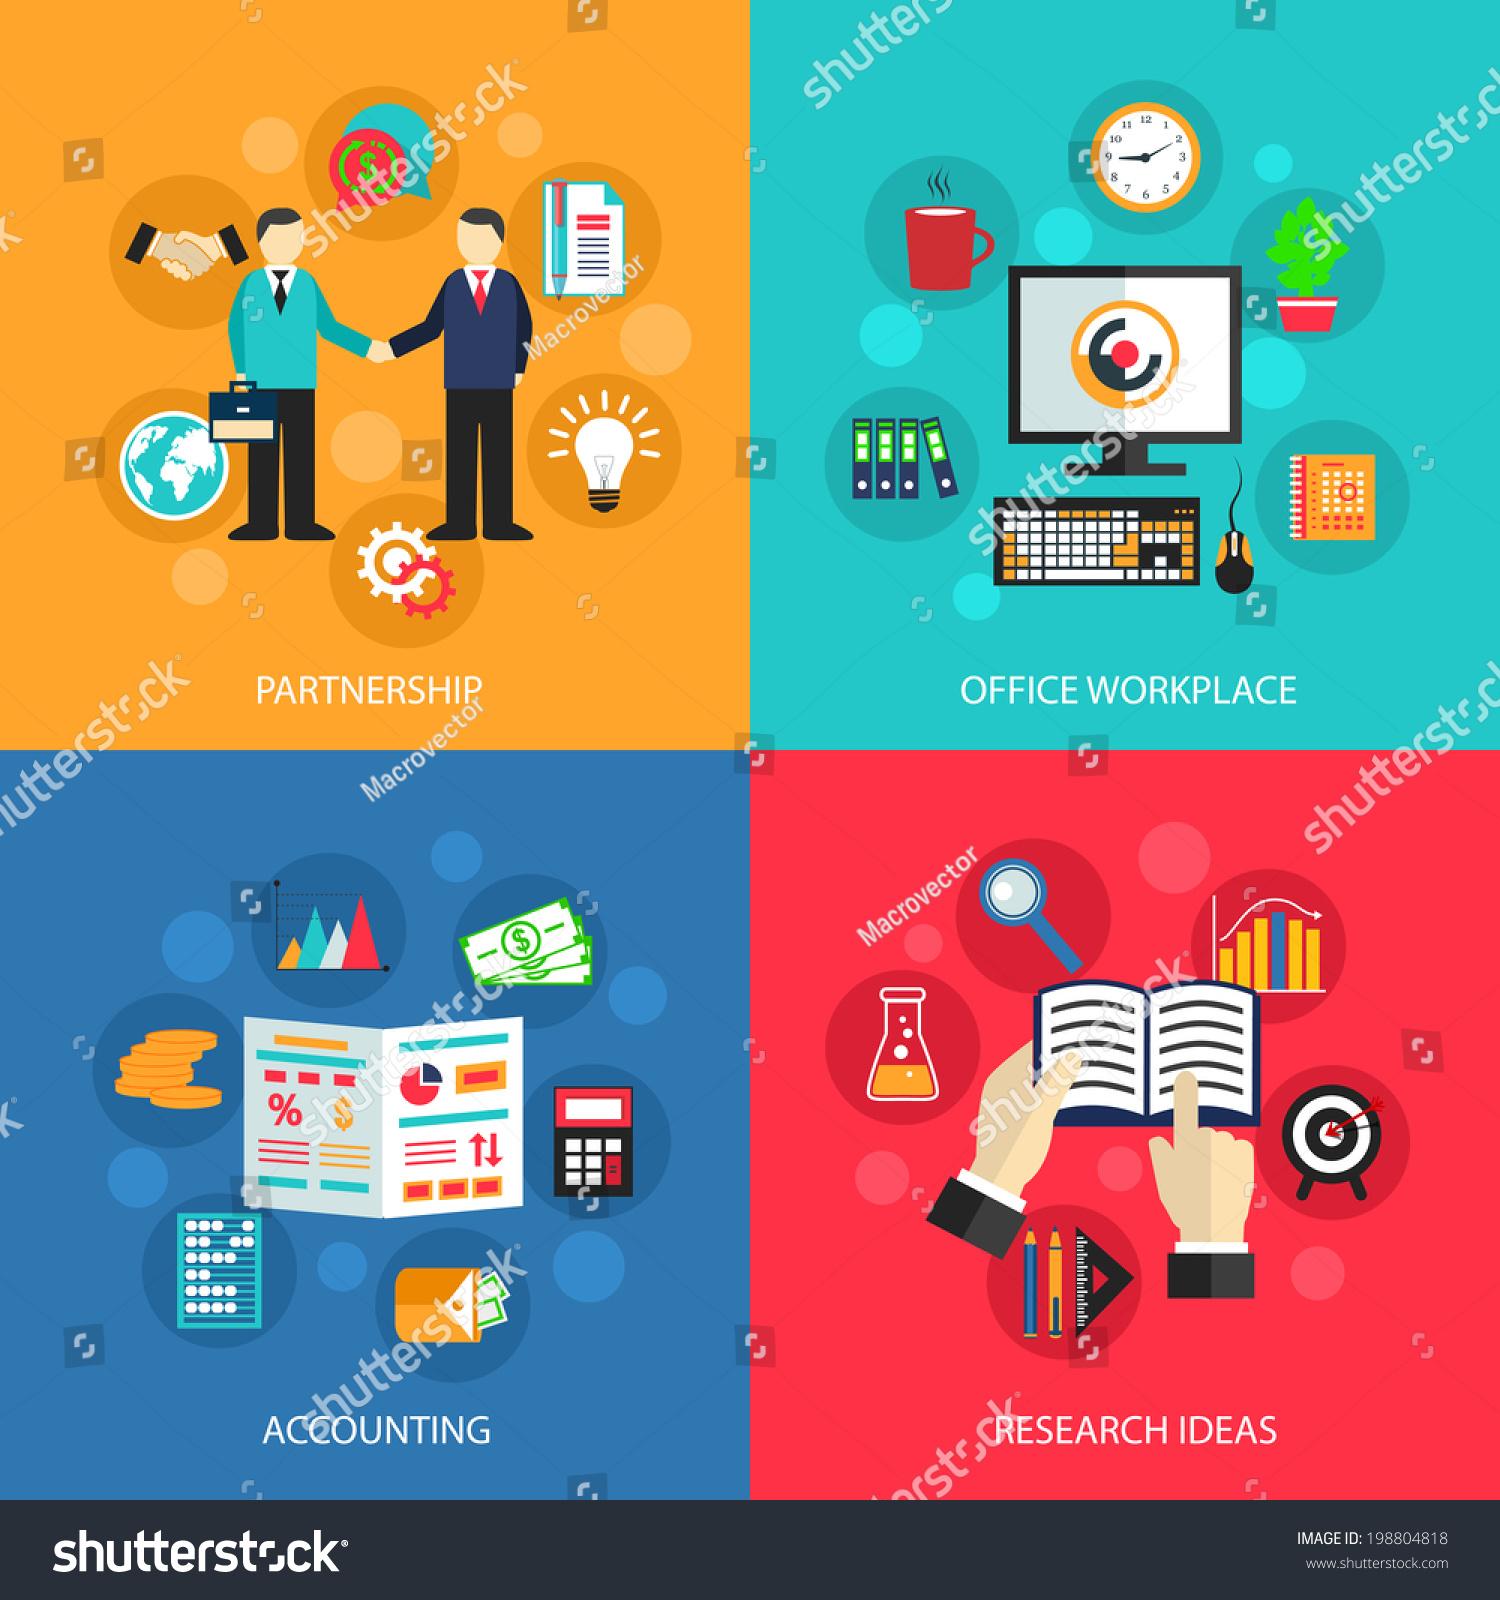 3d design graphic graphic design project ideas - Web Design Project Ideas